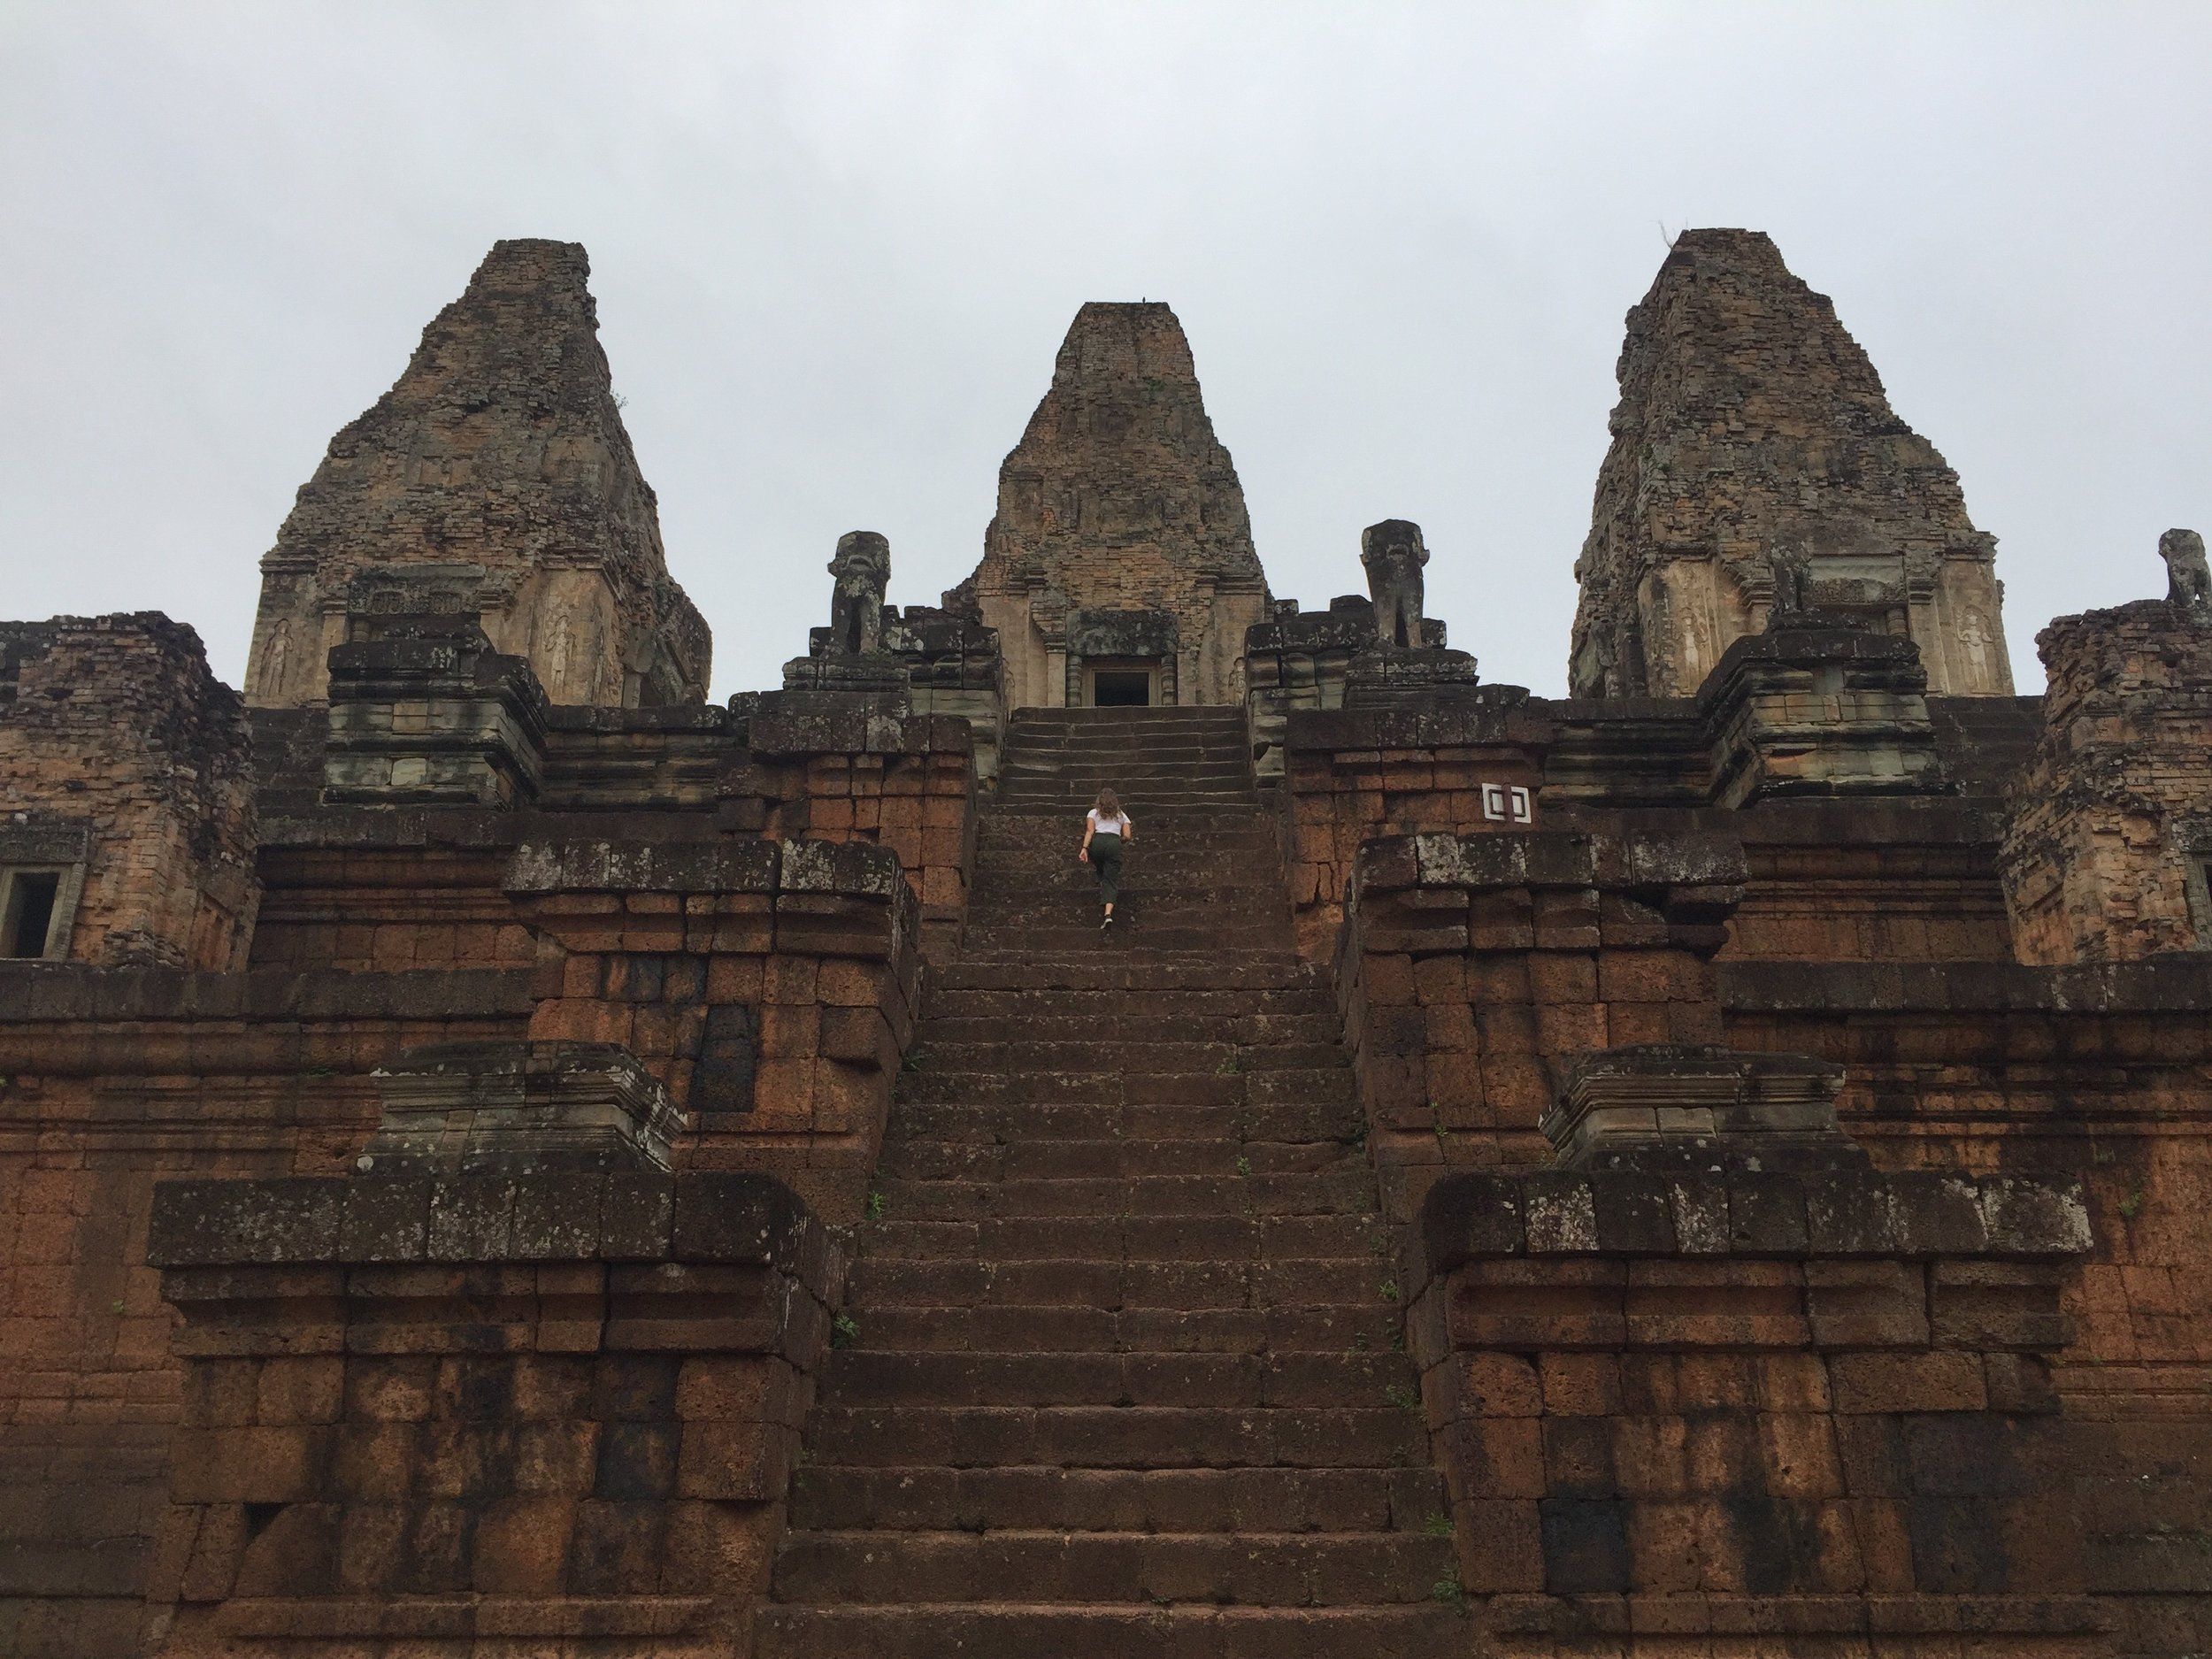 East Mebon Temple - 10th Century AD Hindu temple dedicated to the deity Shiva built during the reign of King Rajendravarman II. Originally it stood above water.